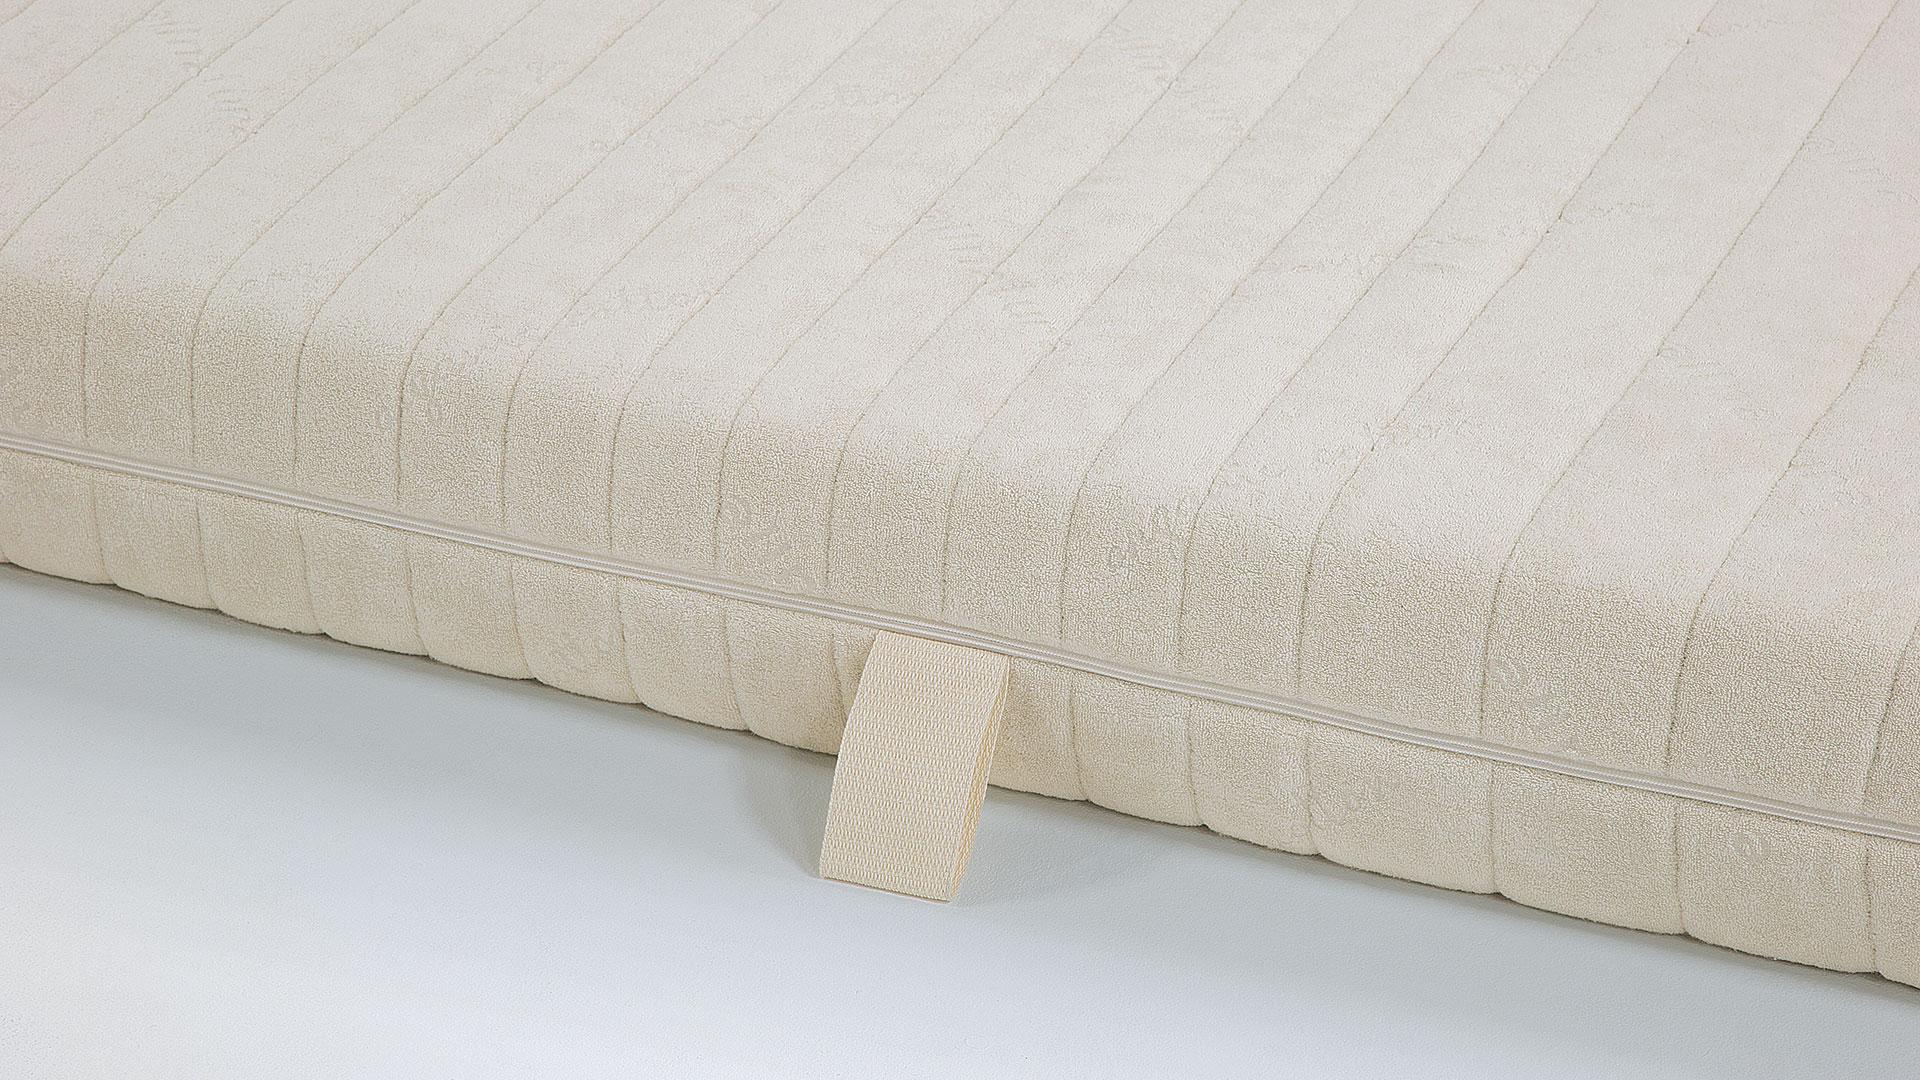 matratzen testsieger stiftung warentest supra comfort. Black Bedroom Furniture Sets. Home Design Ideas